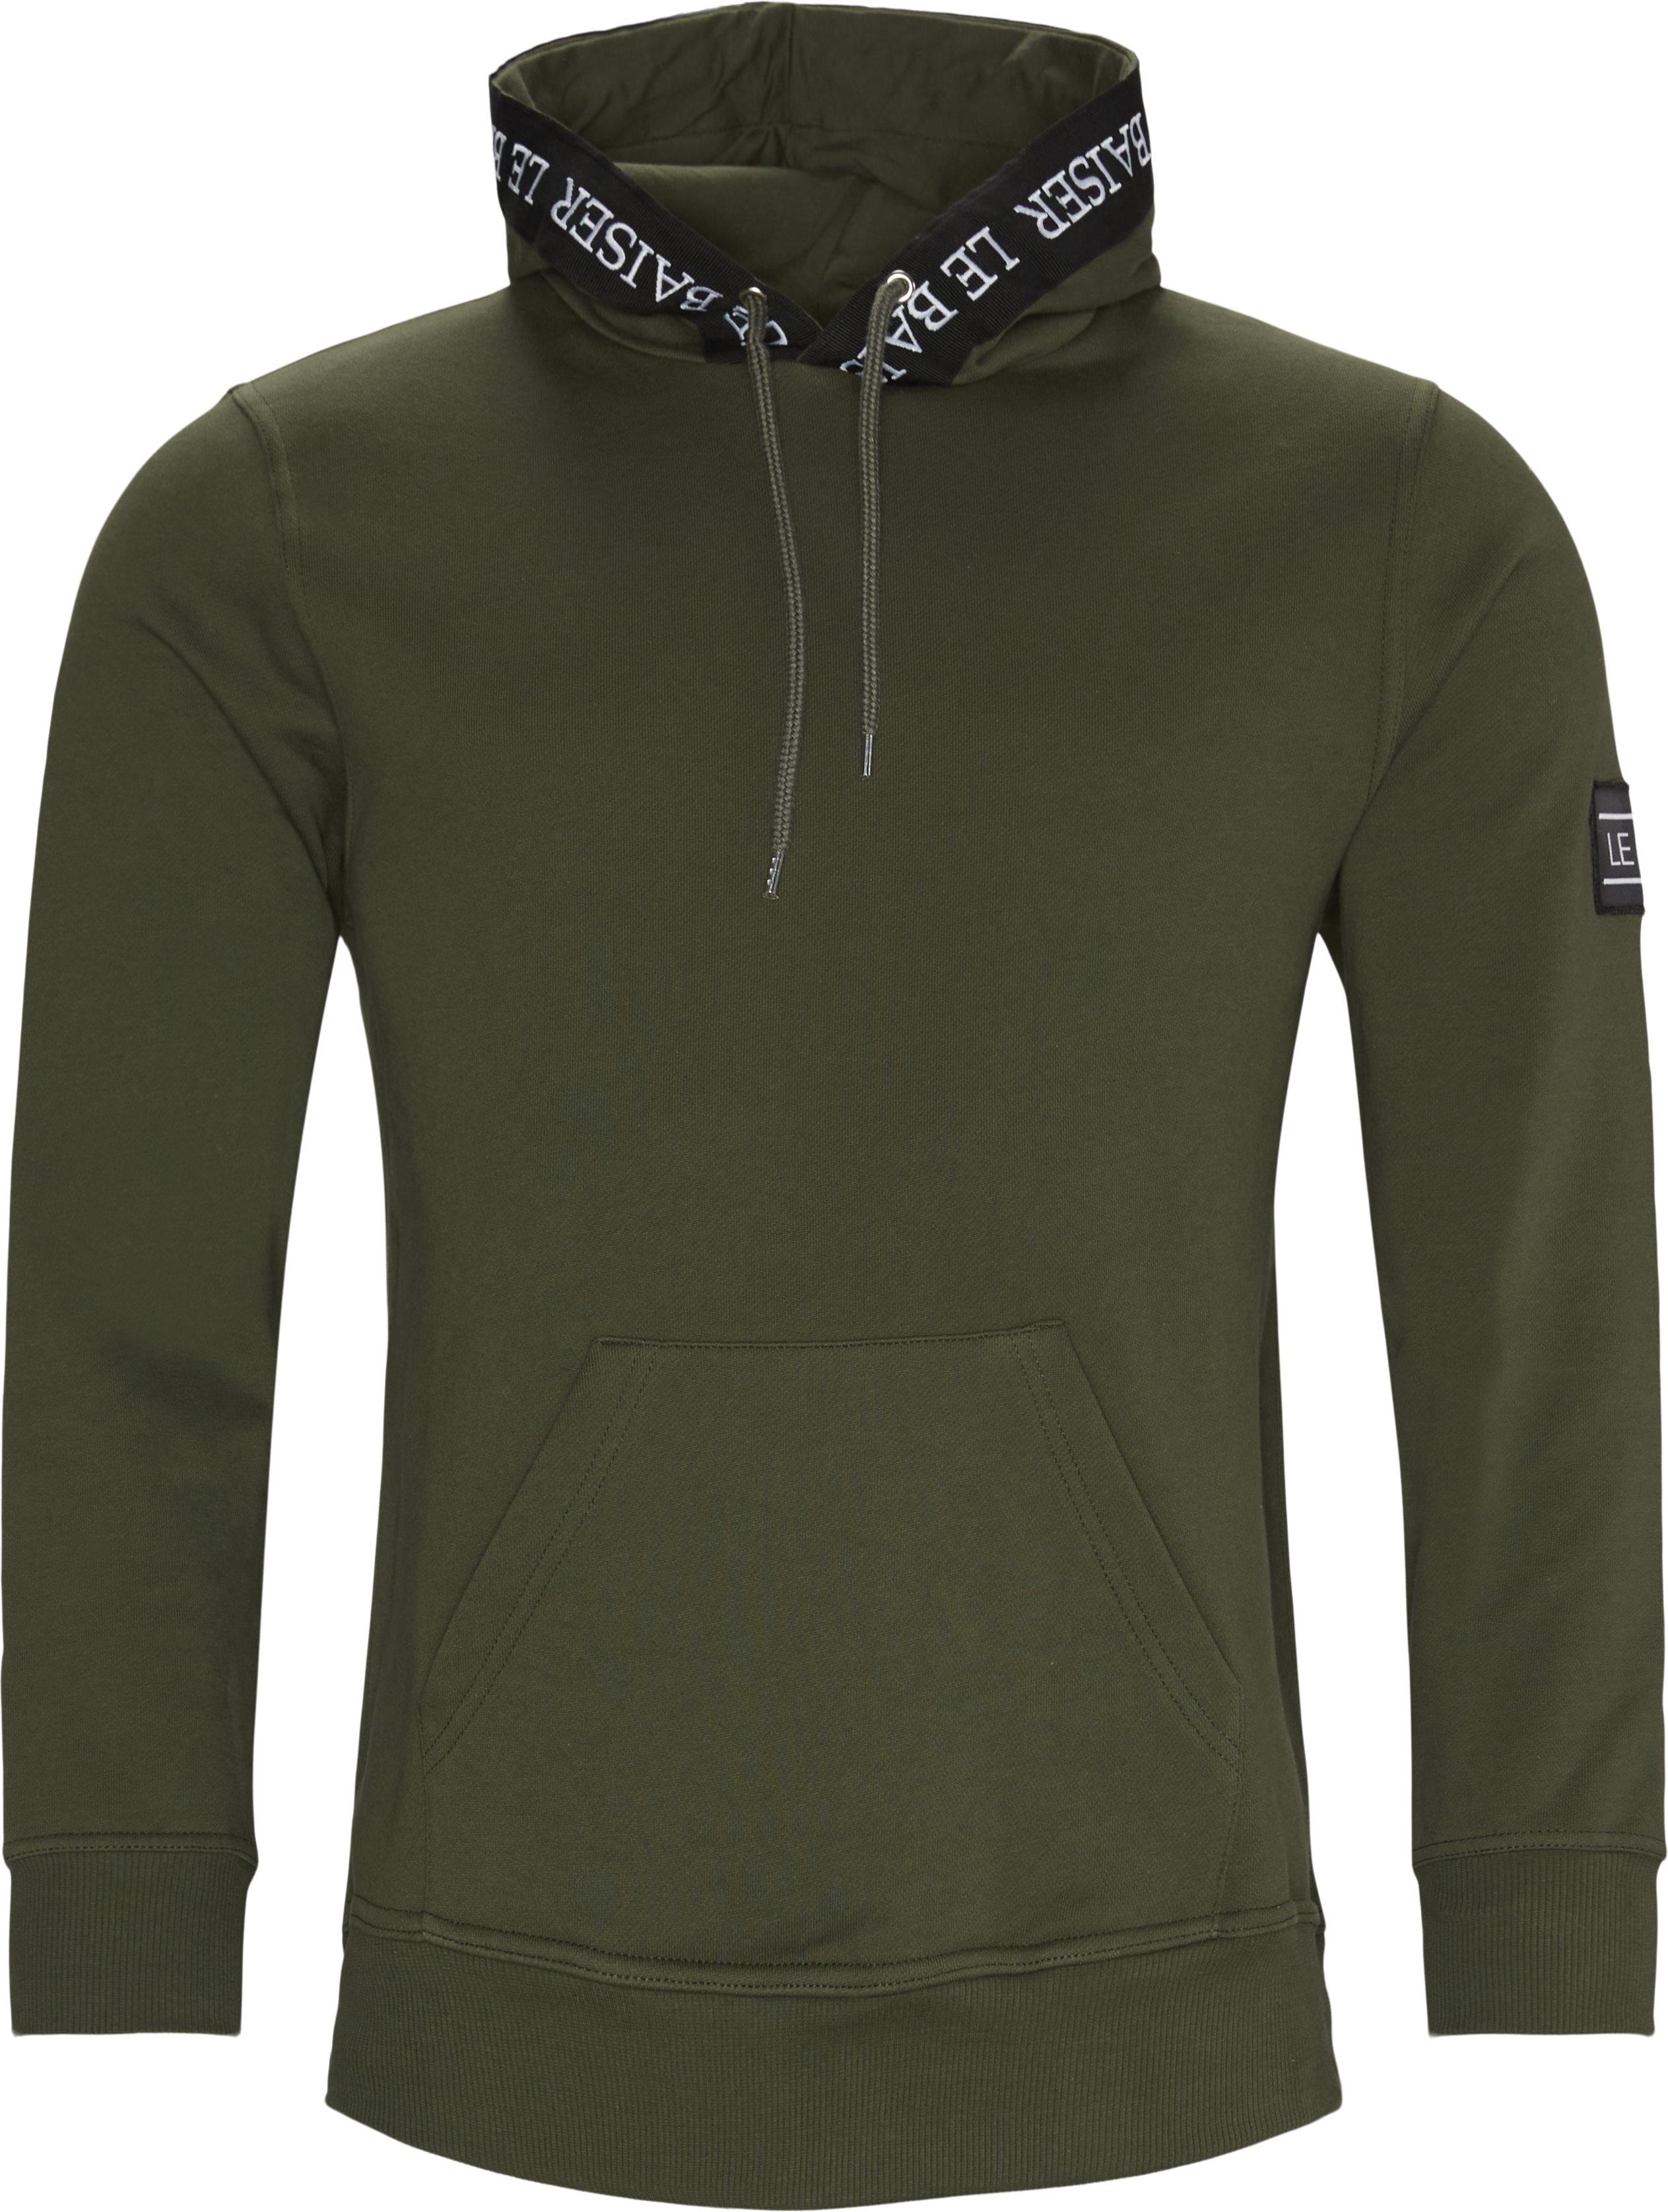 Provence Hoodie - Sweatshirts - Regular - Army